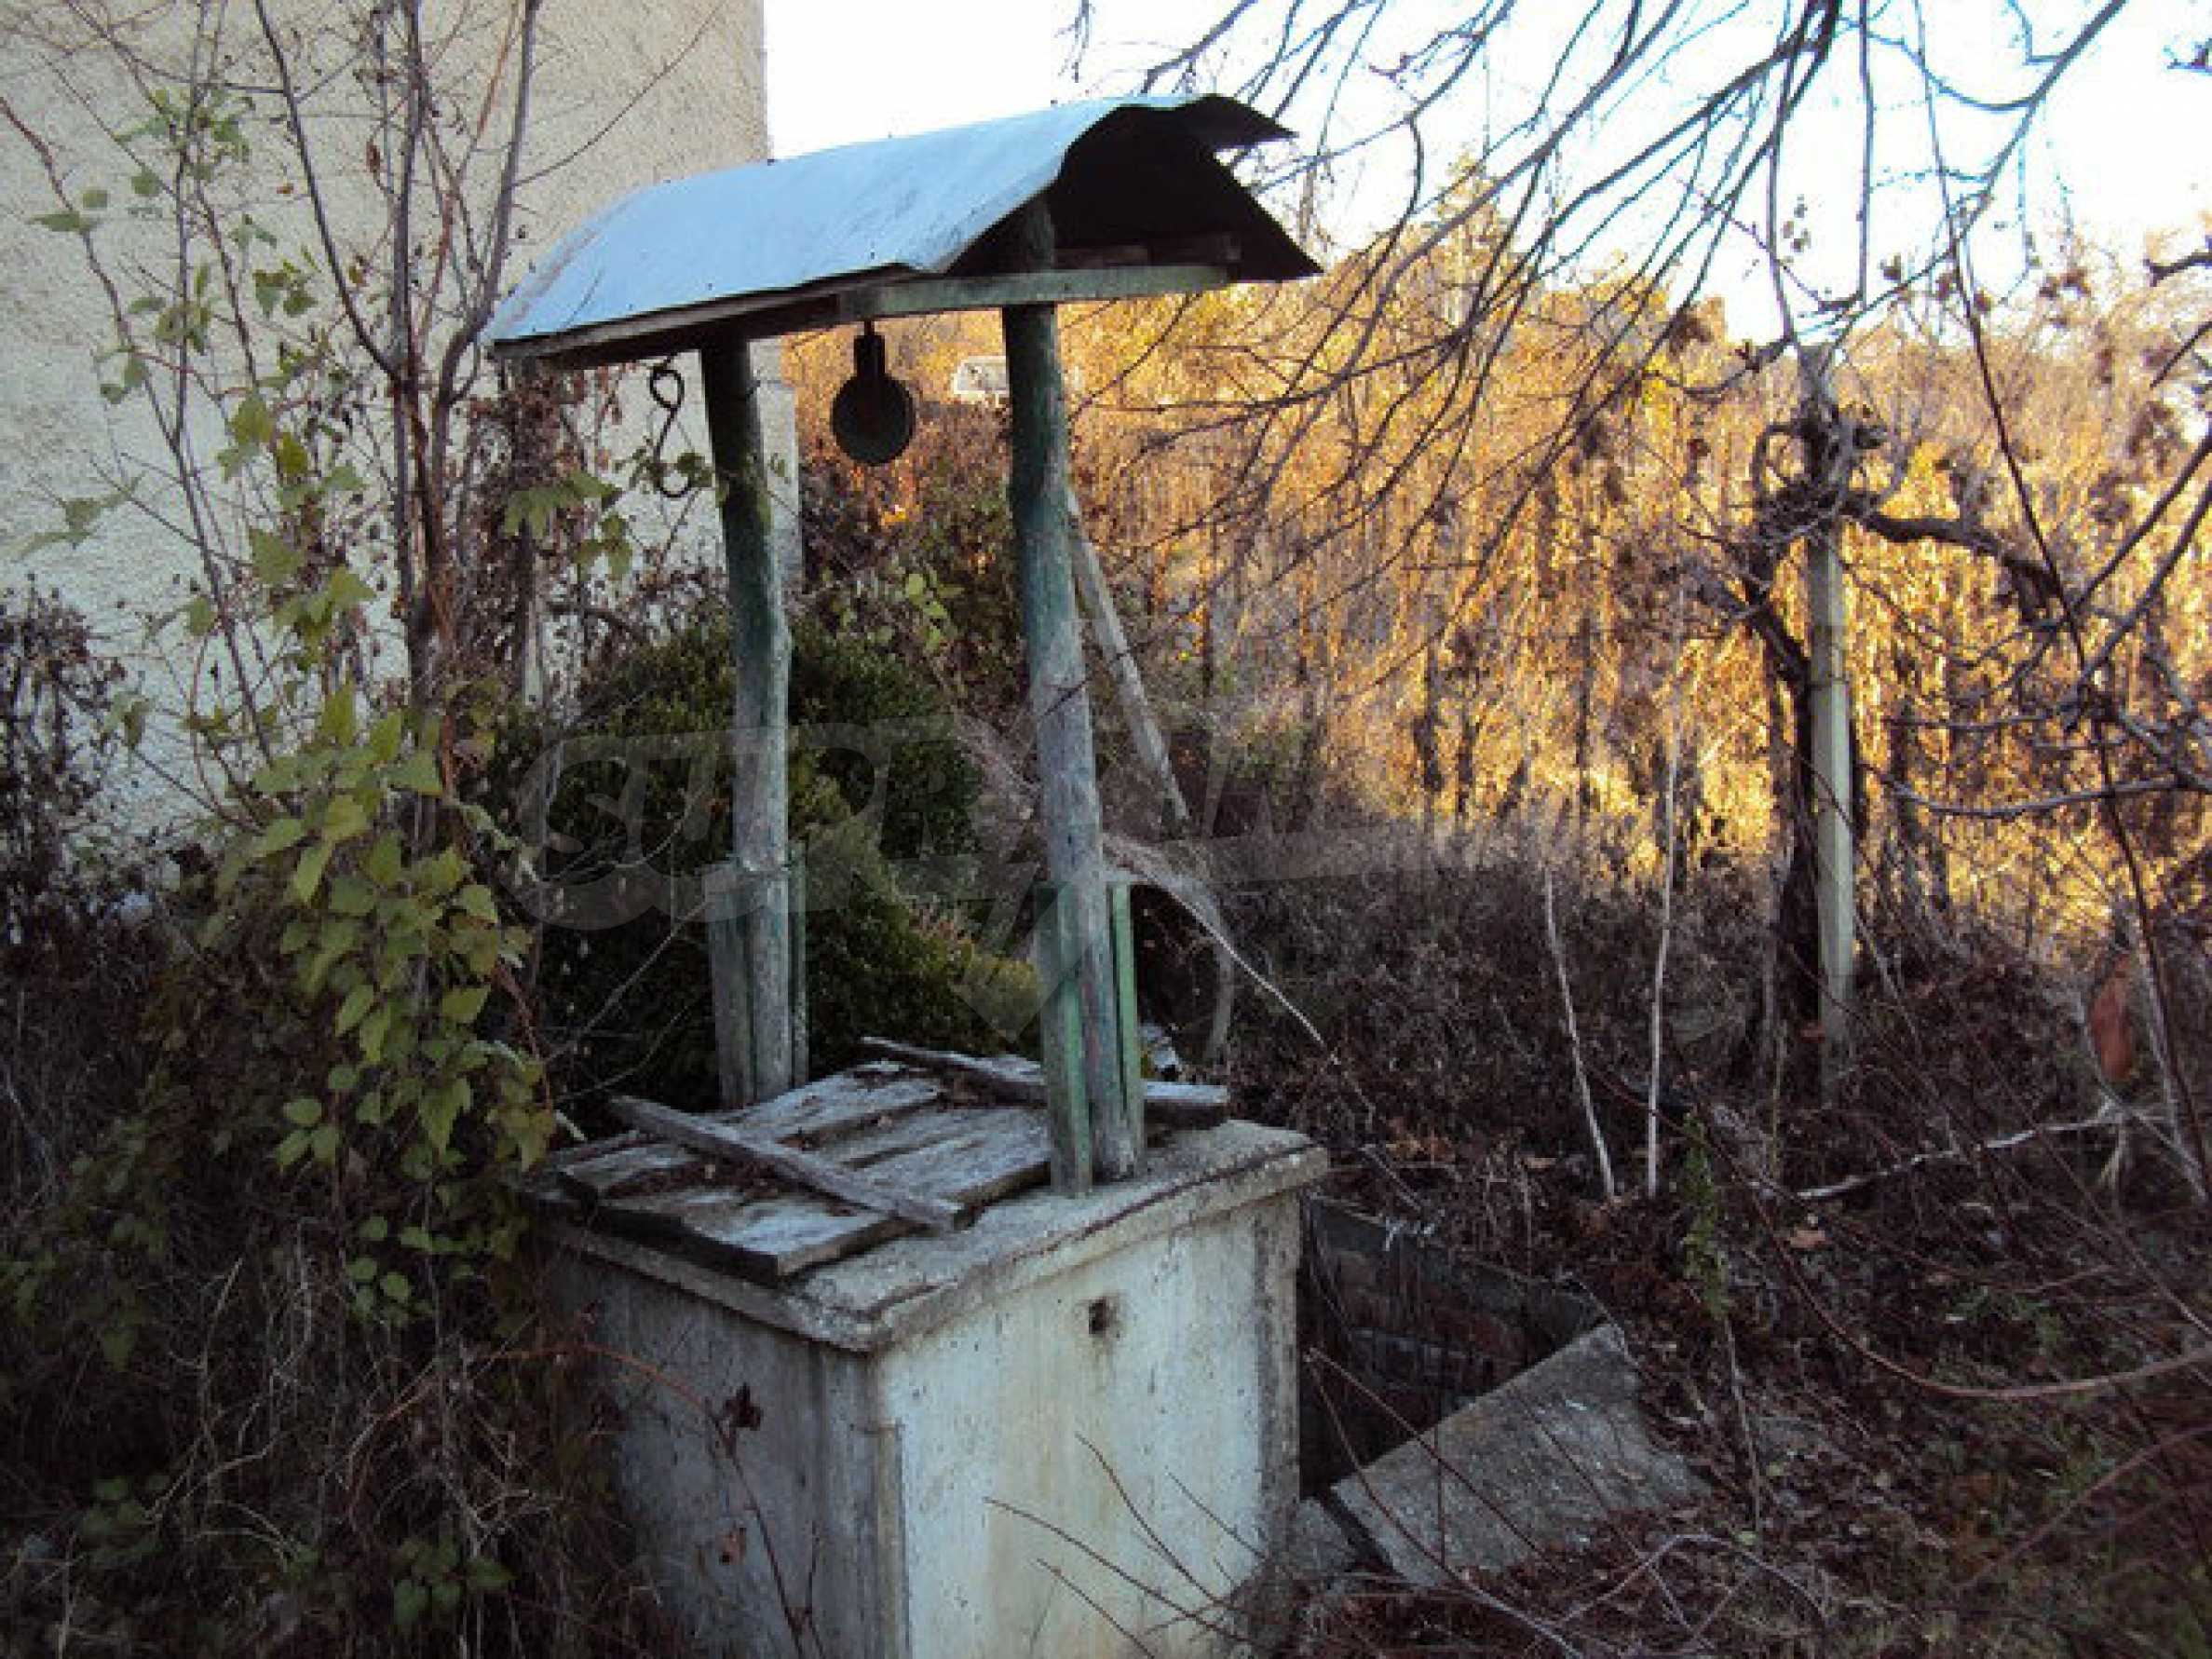 House with garden 25 km away from Veliko Tarnovo 7